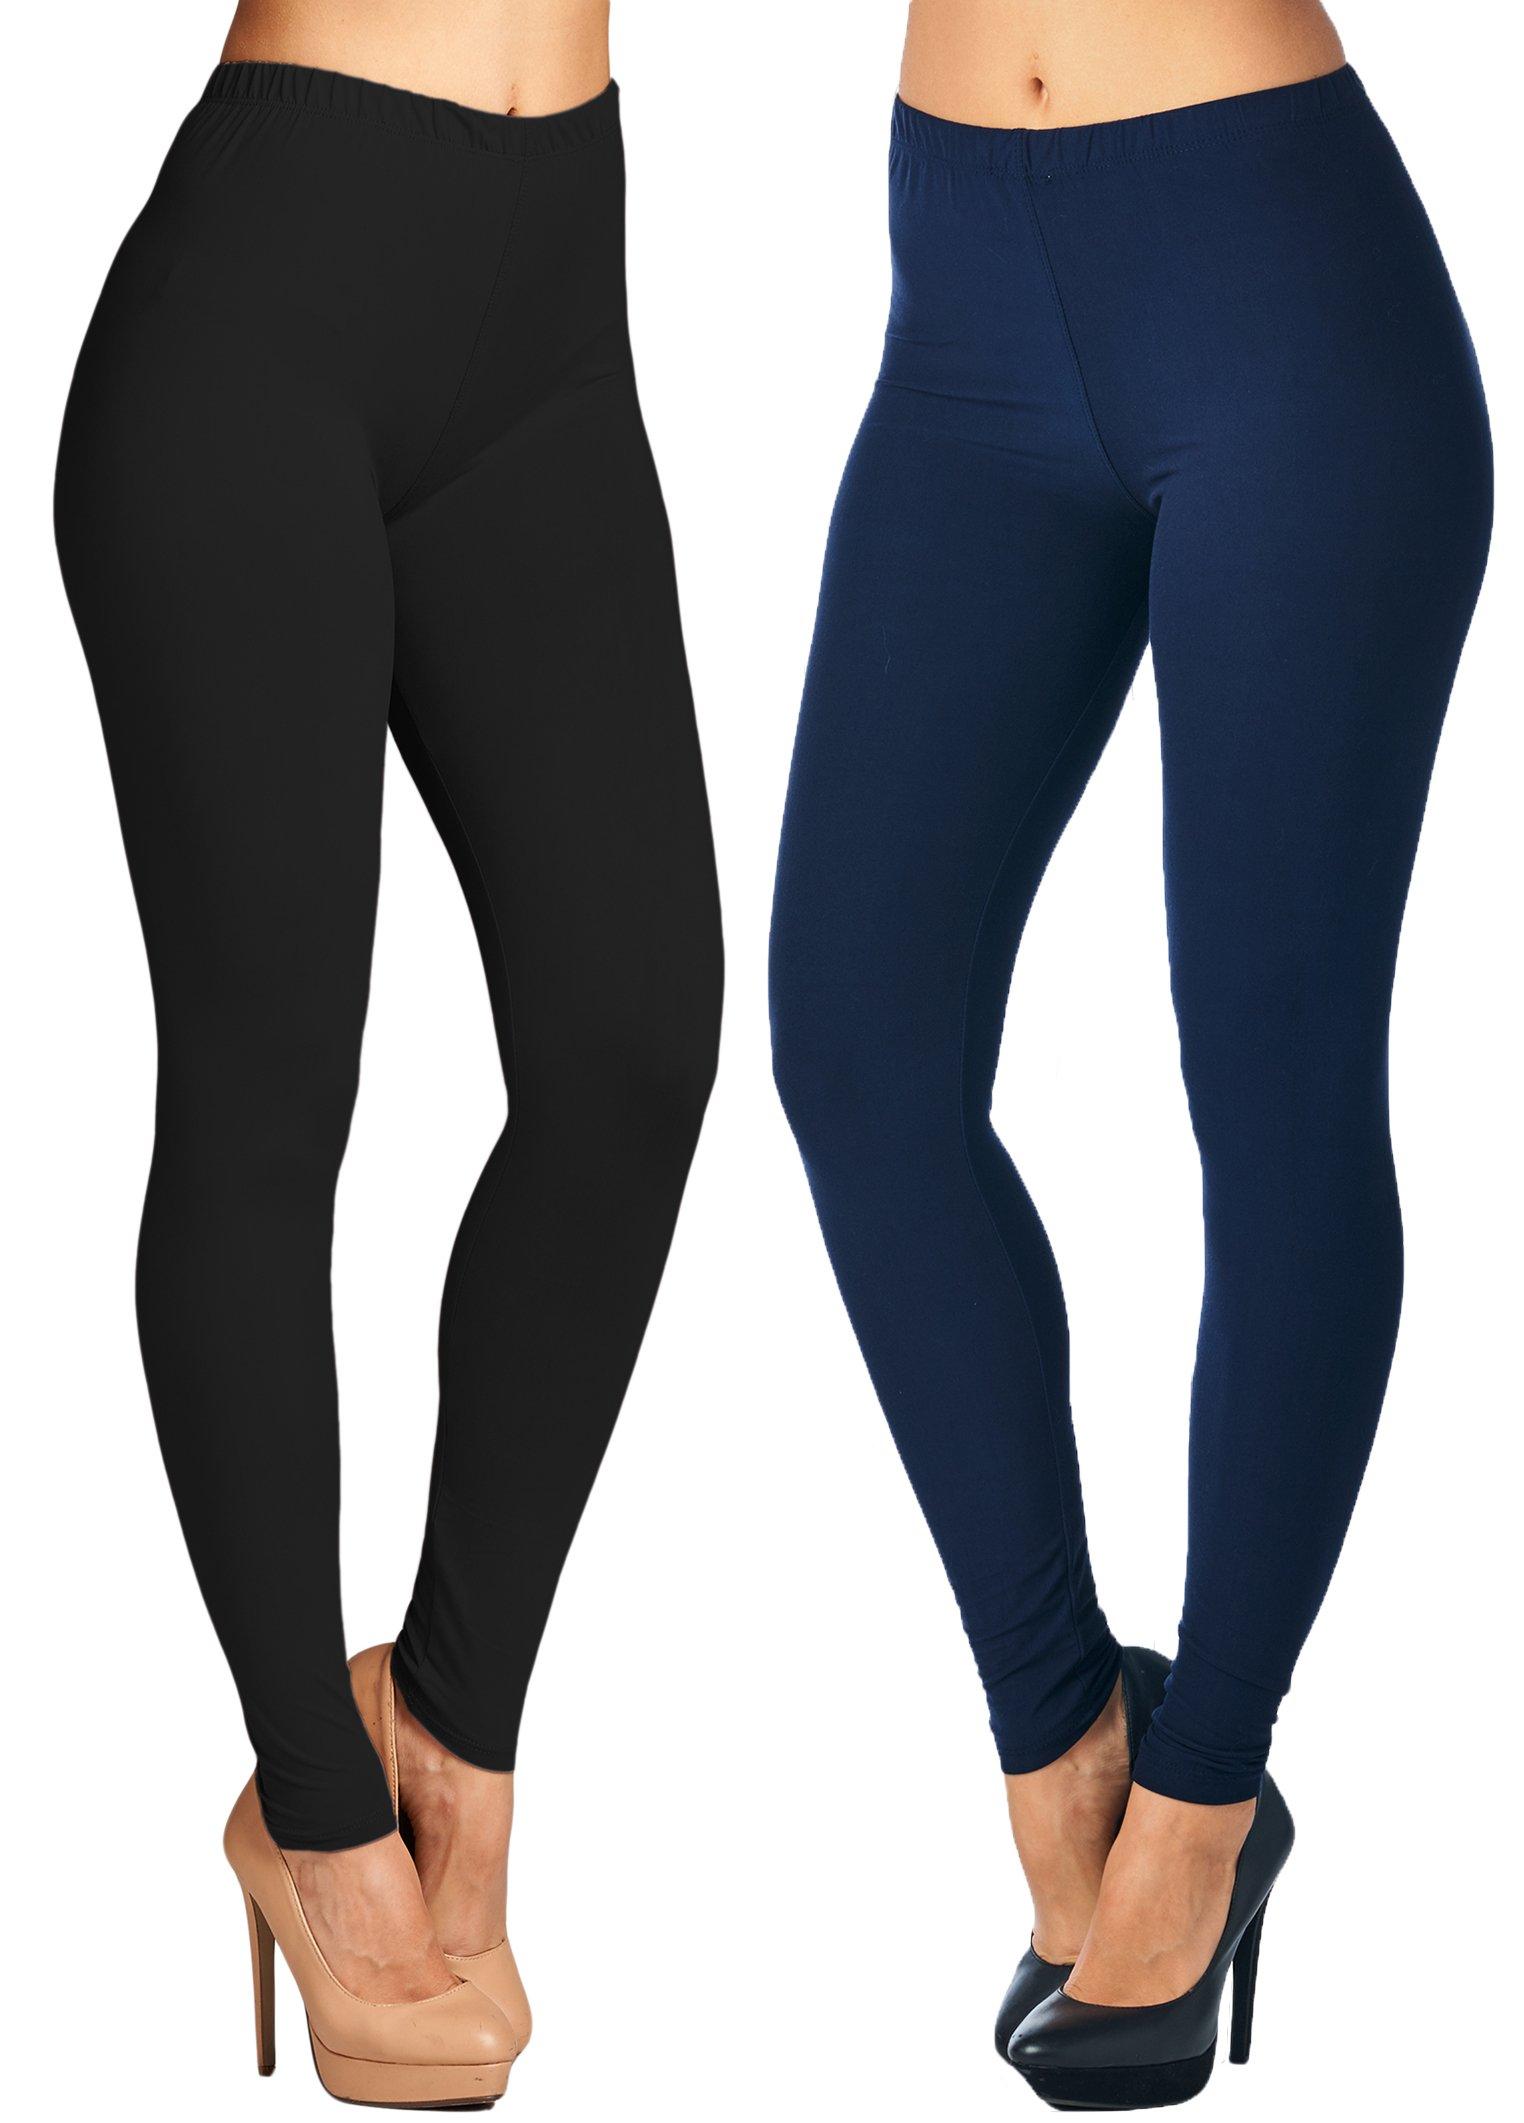 Leggings Mania 2-pk Women's Plus Solid Colored High Waist Leggings Black Navy